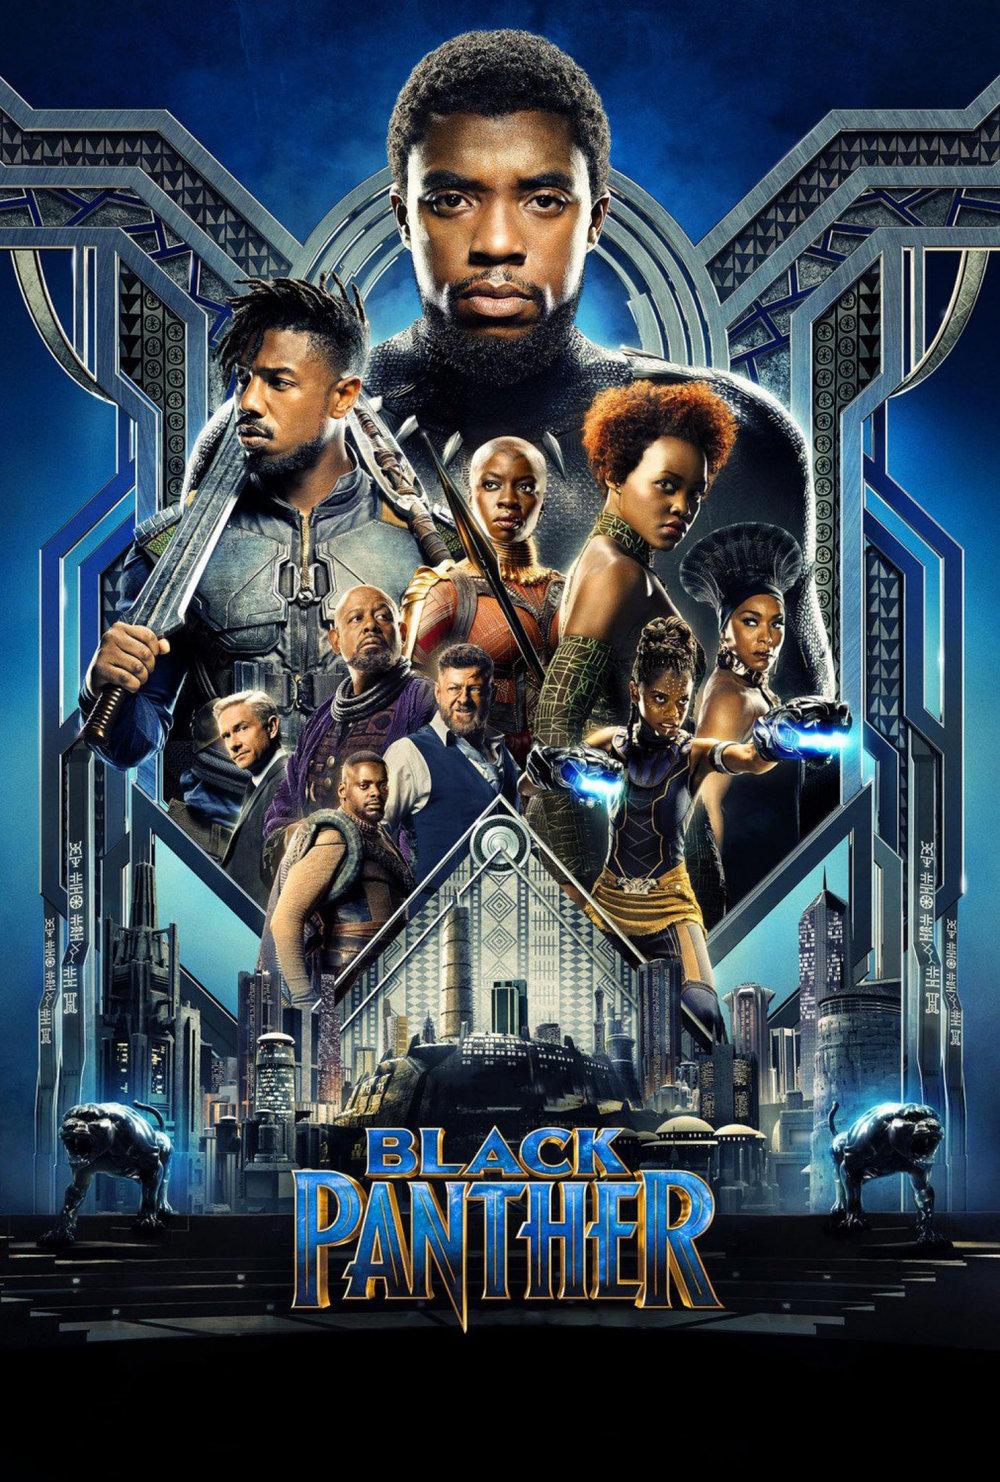 Black Panther   (2018) dir. Ryan Coogler Rated: PG-13 image:©2018  Walt Disney Studios Motion Pictures